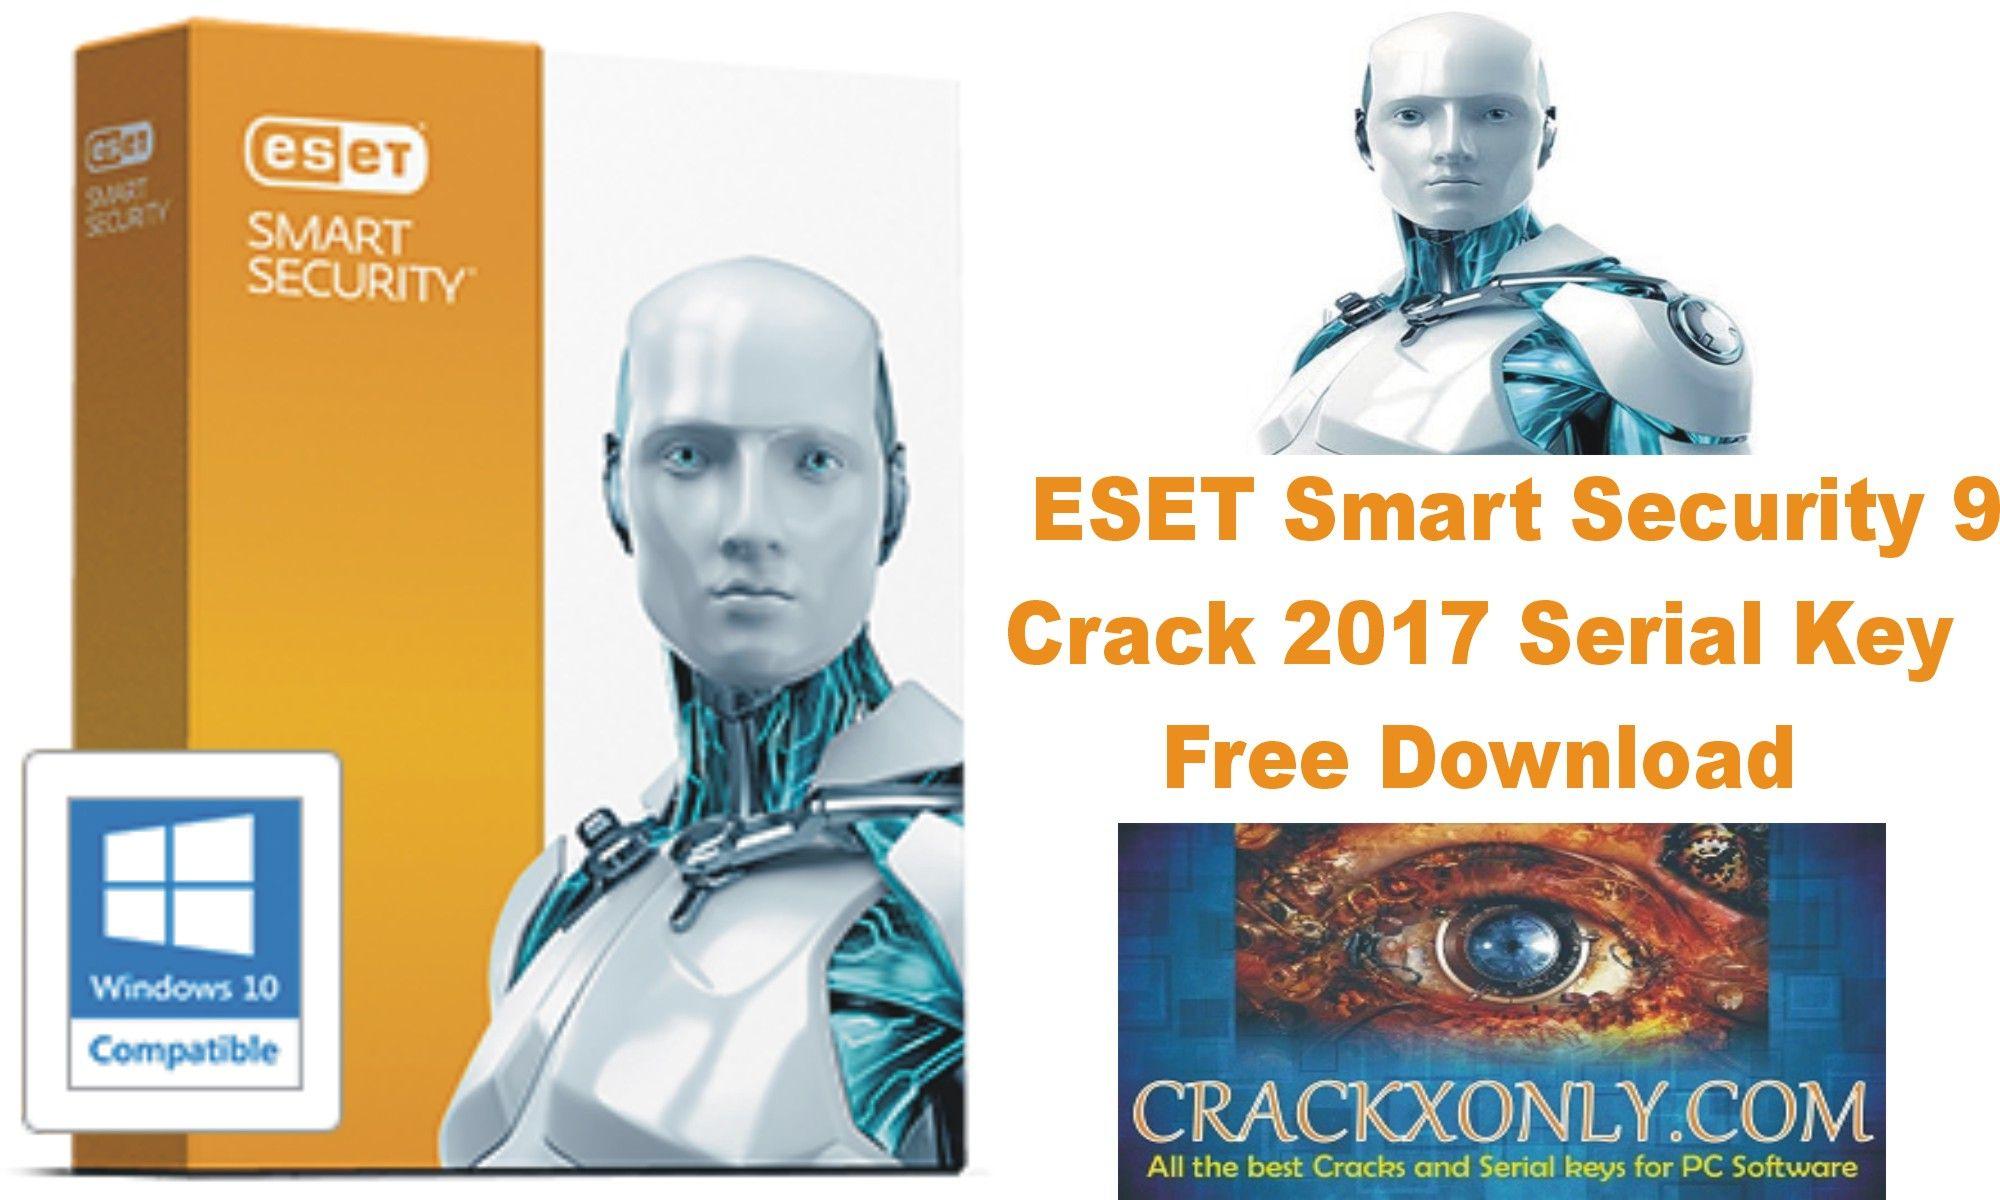 free download crack eset smart security 9